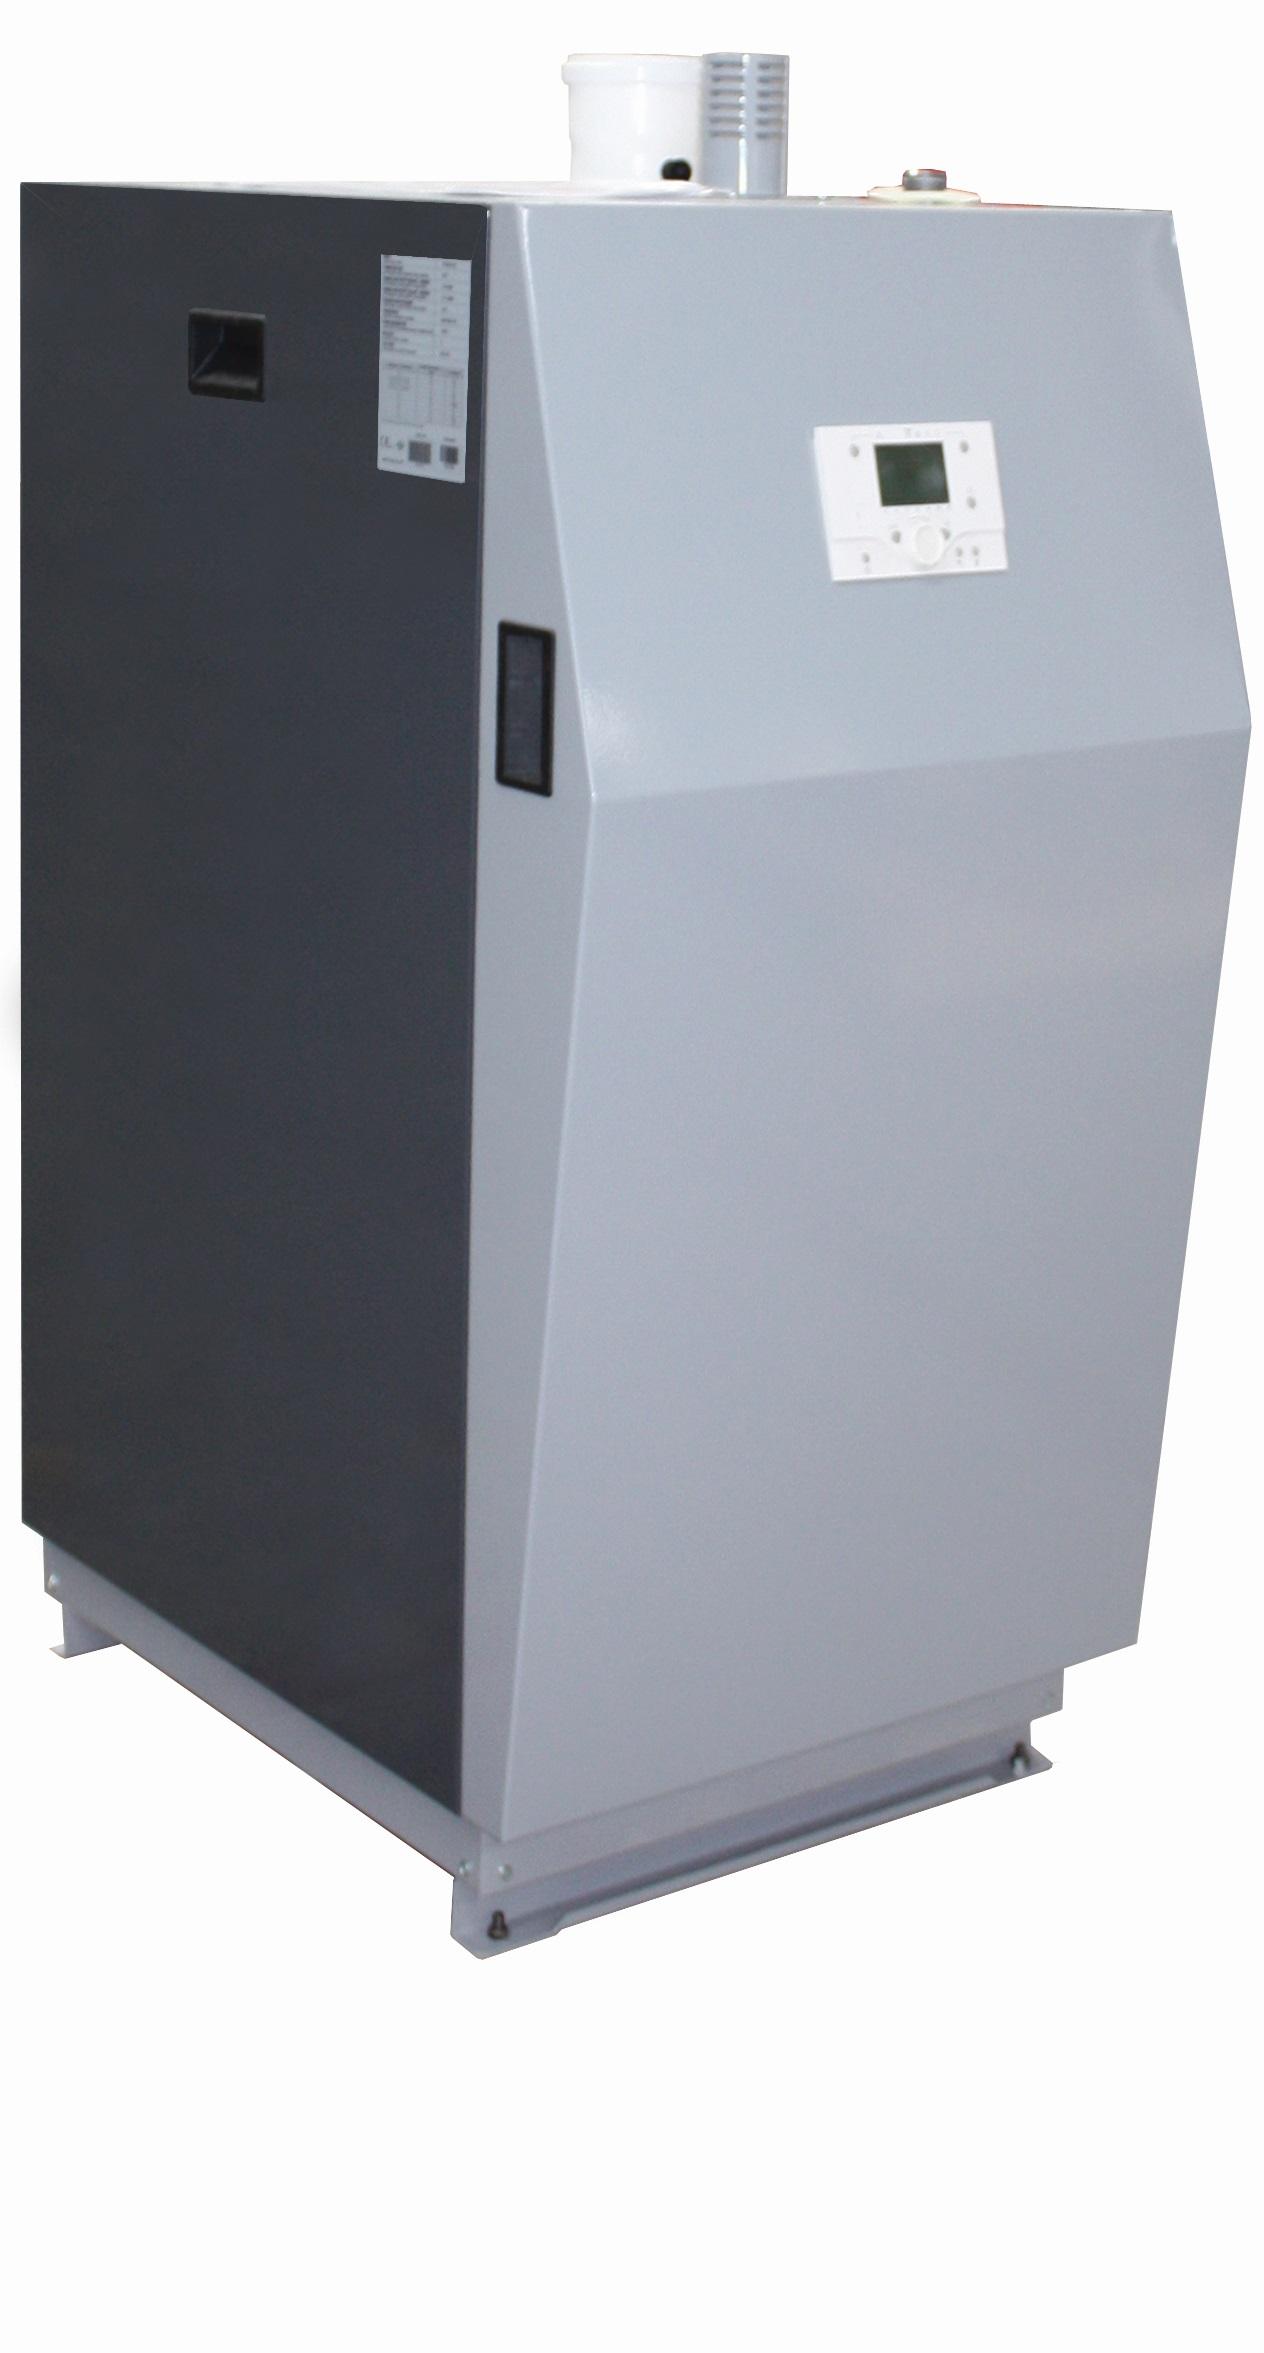 Ongas 300 Floor Standing Condensing Boiler